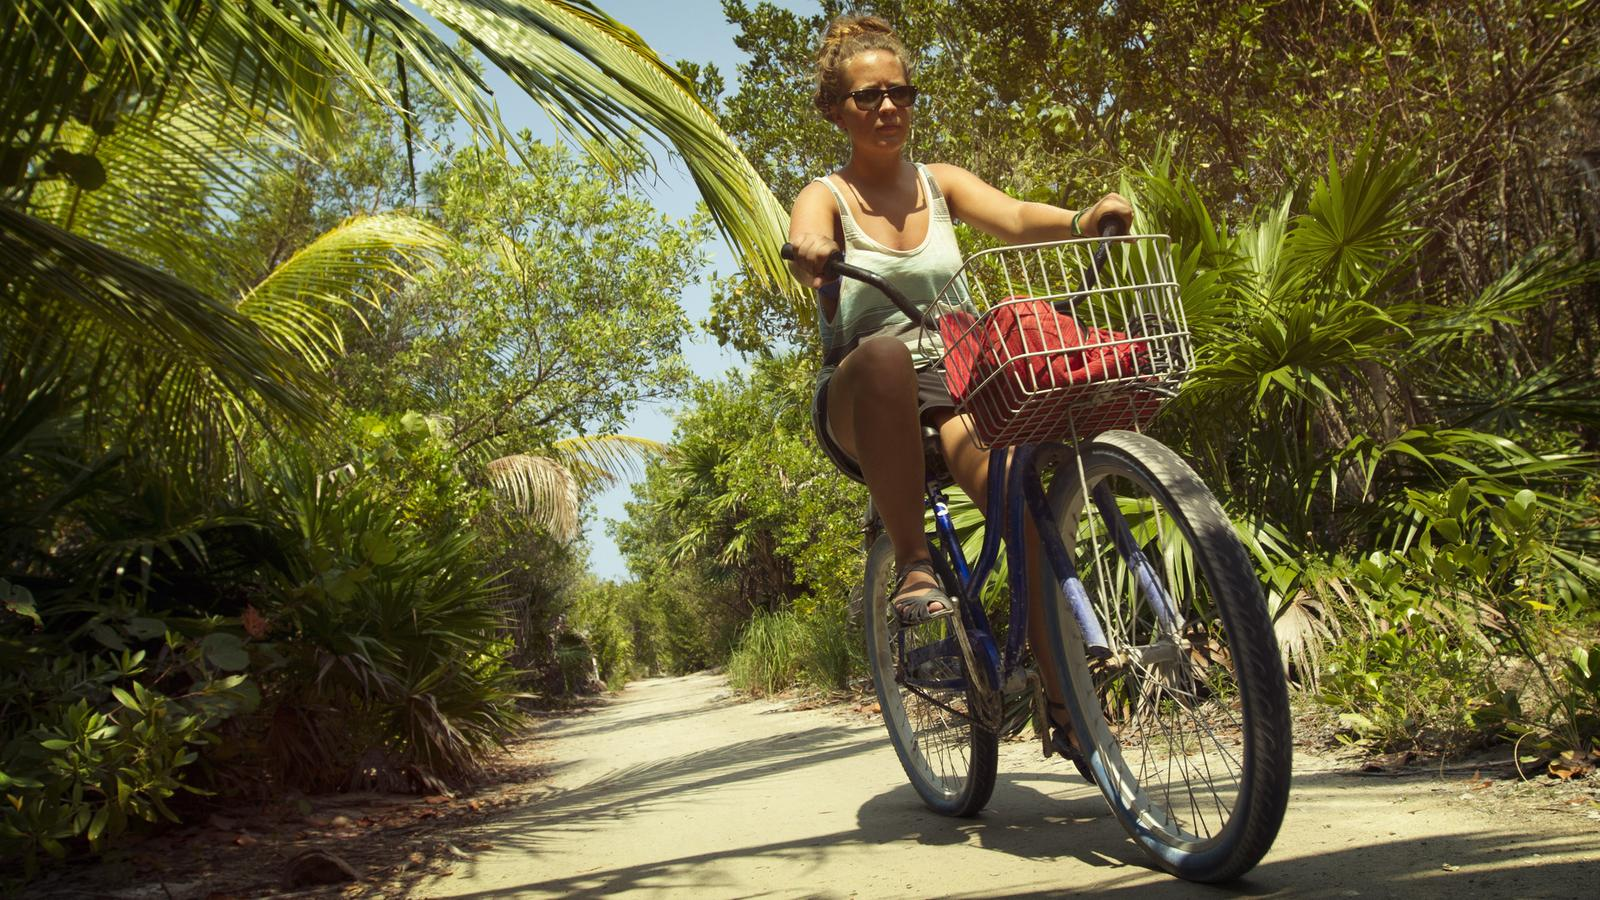 Female traveller biking down a path amongst beautiful lush scenery in Central America